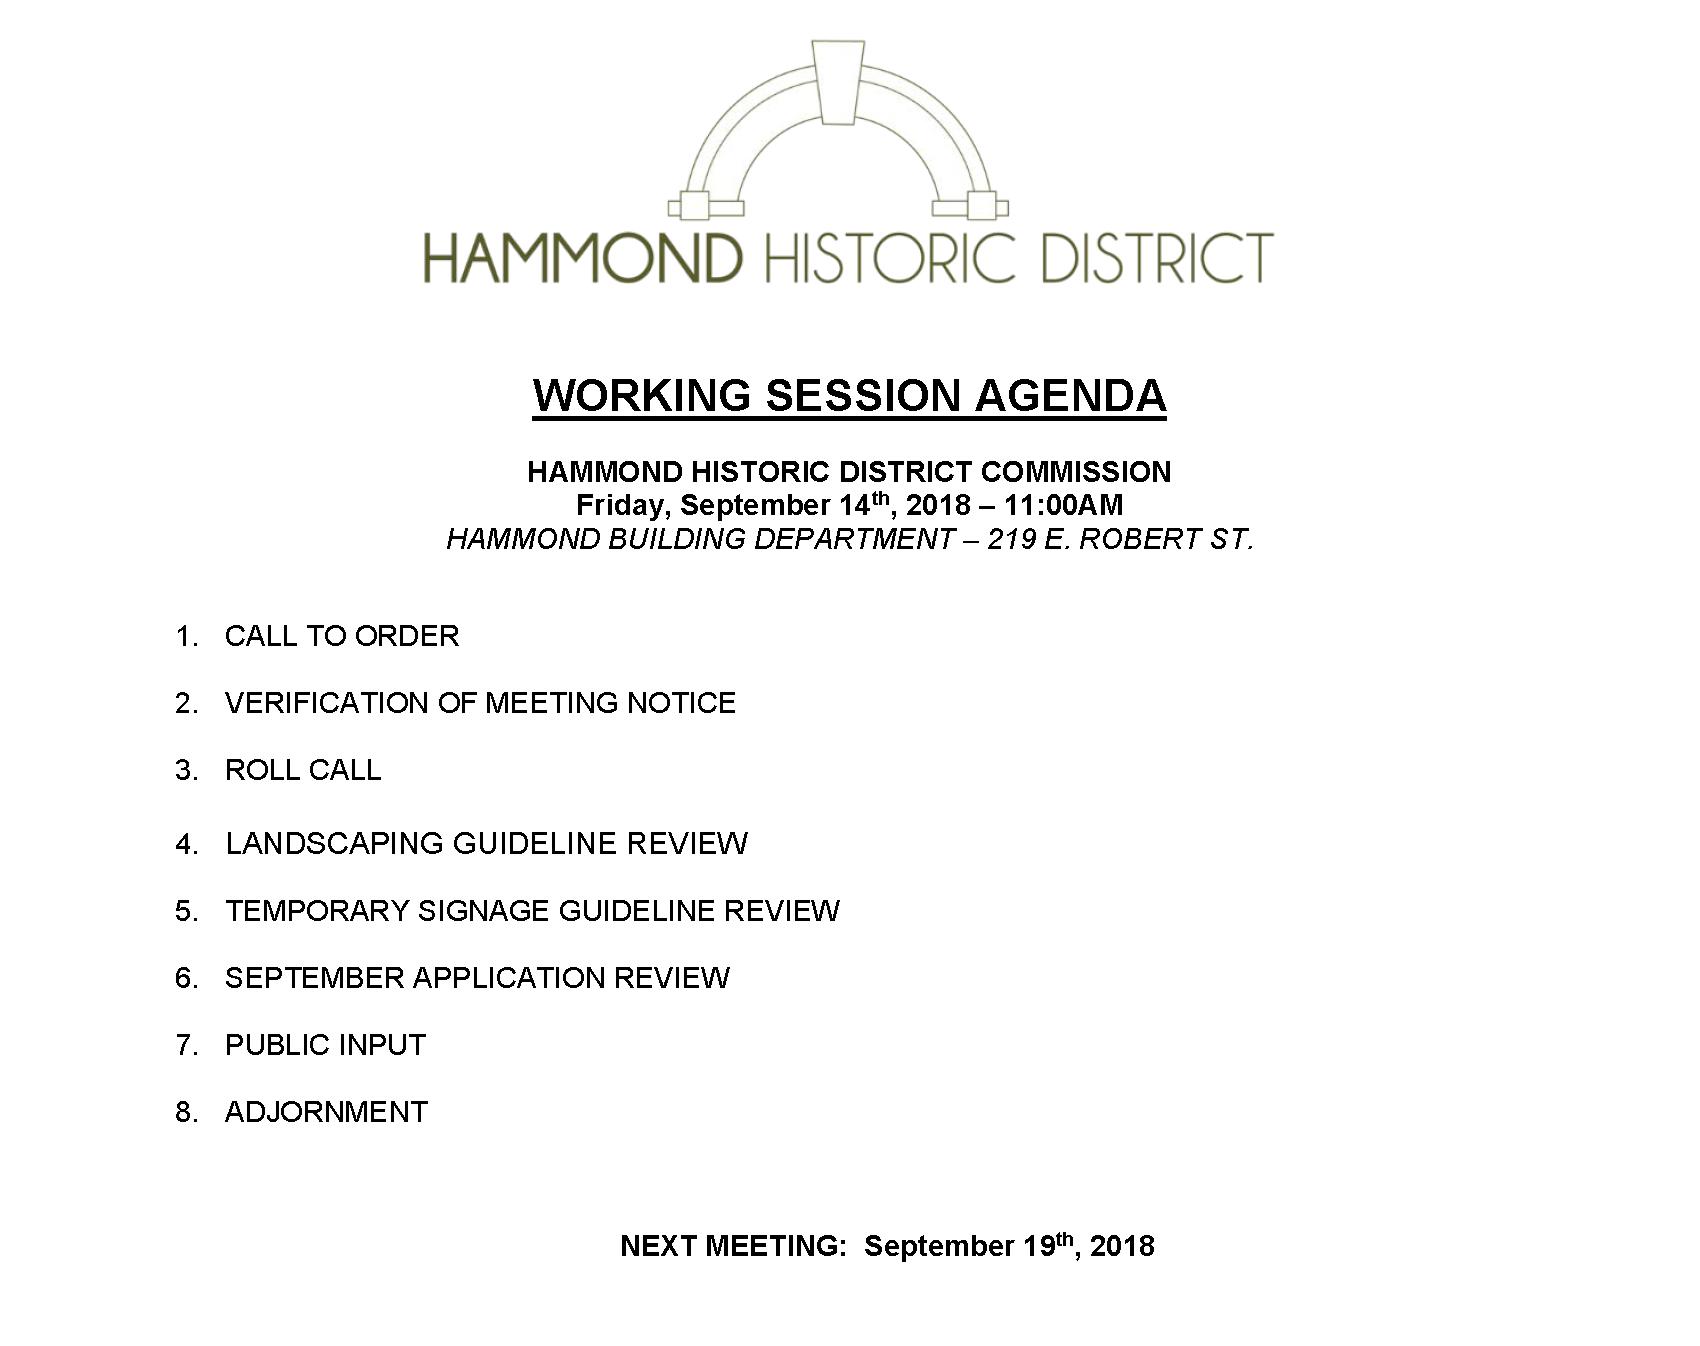 2018_09 September Working Session Agenda.png